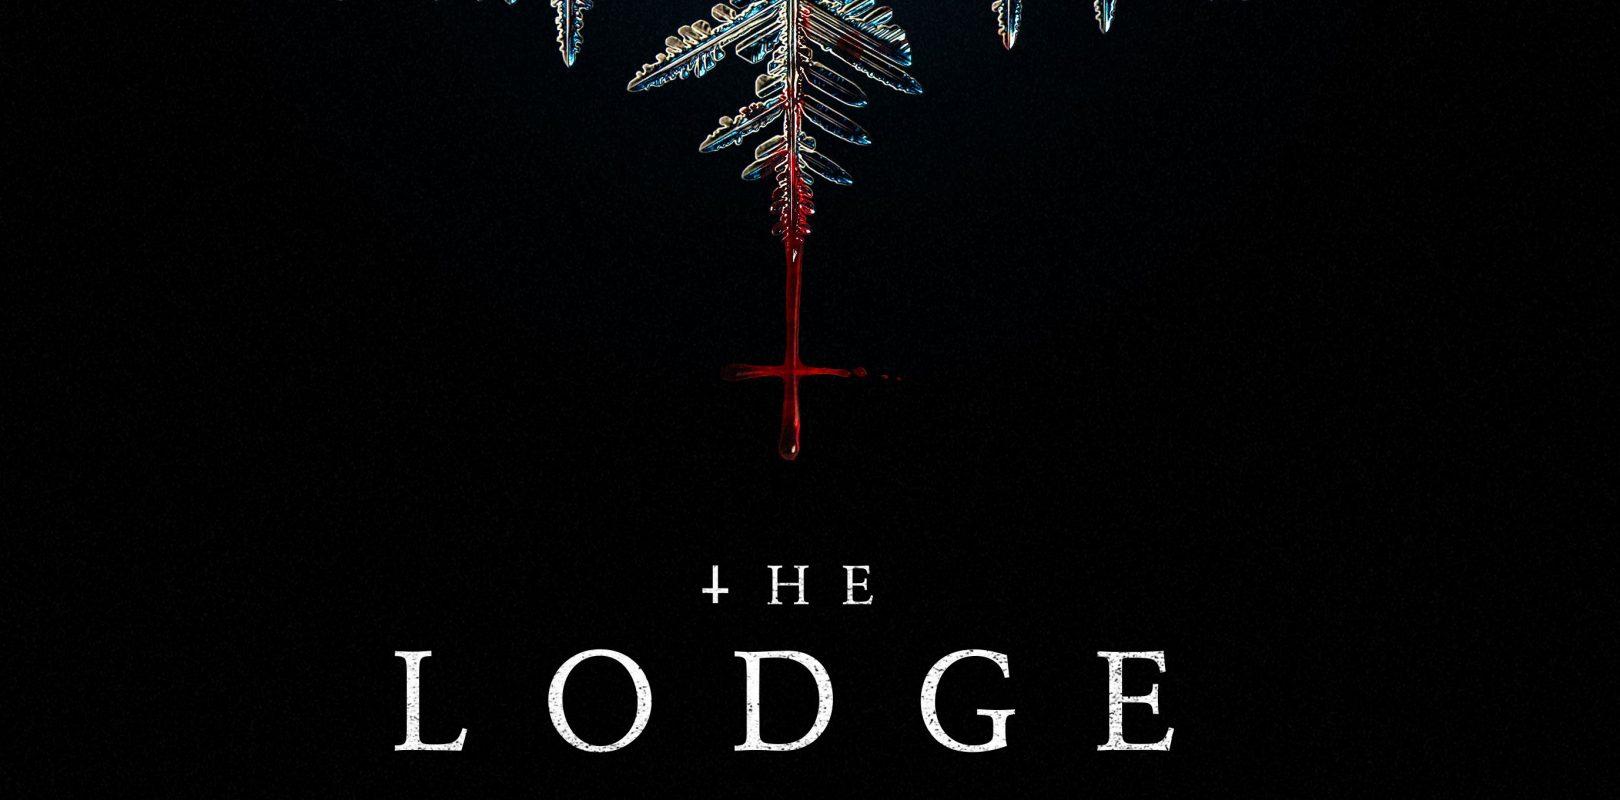 cb01 The Lodge streaming film ita ilgeniodellostreaming